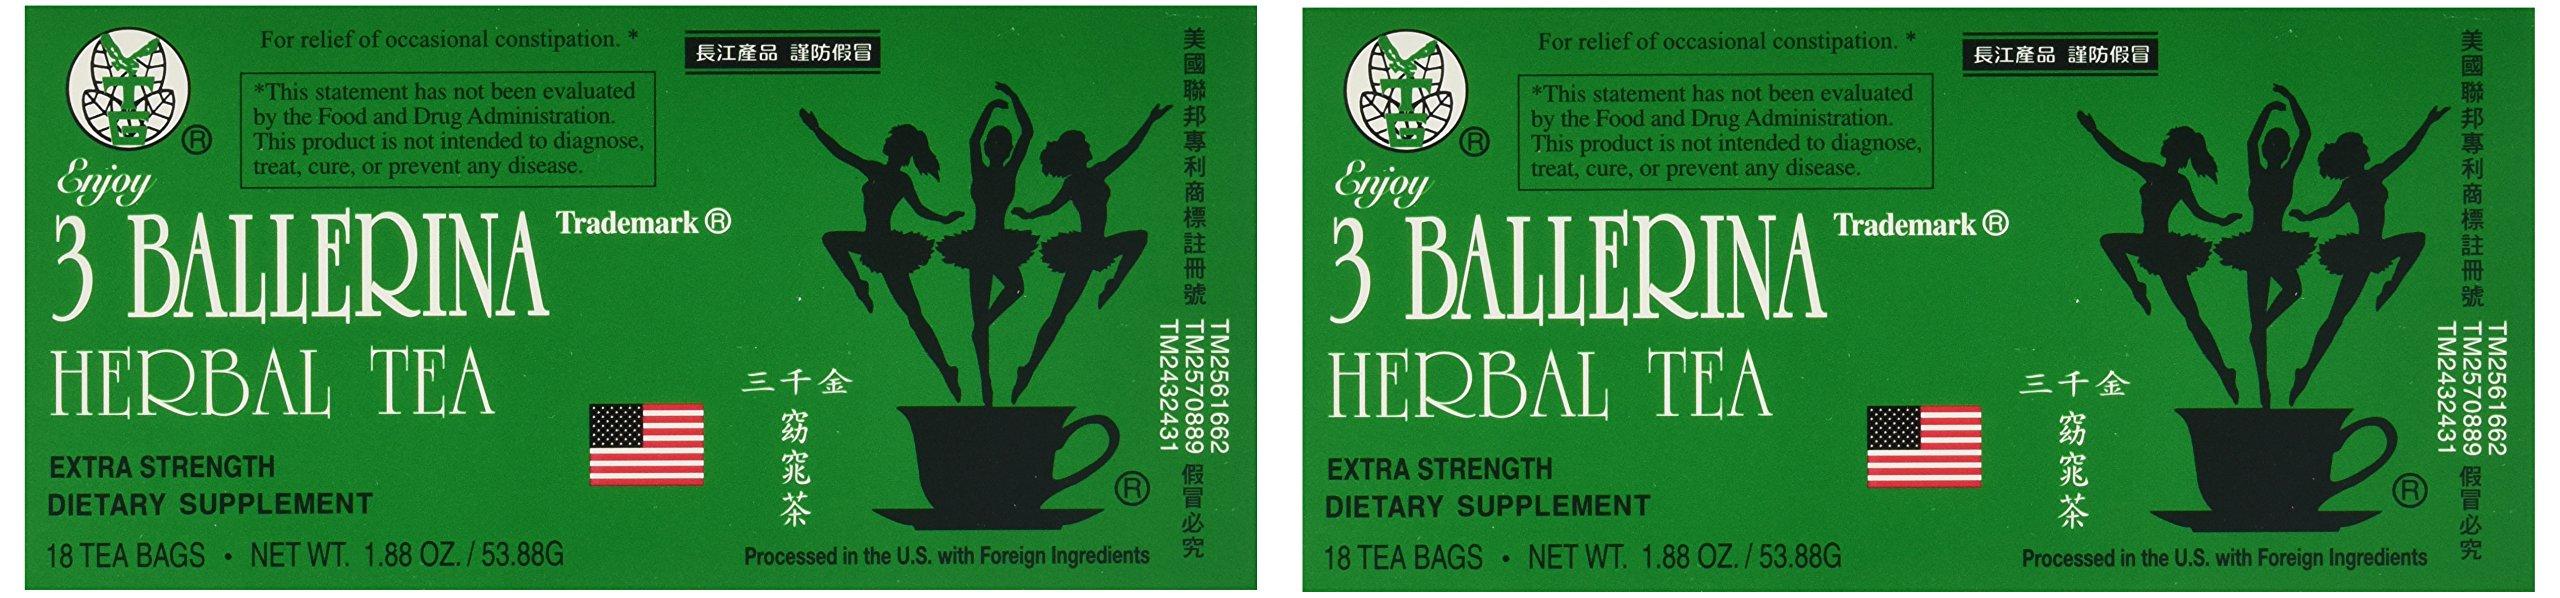 3 Ballerina Dieters Tea Extra Strength - 2 Pack (36 Tea Bags)